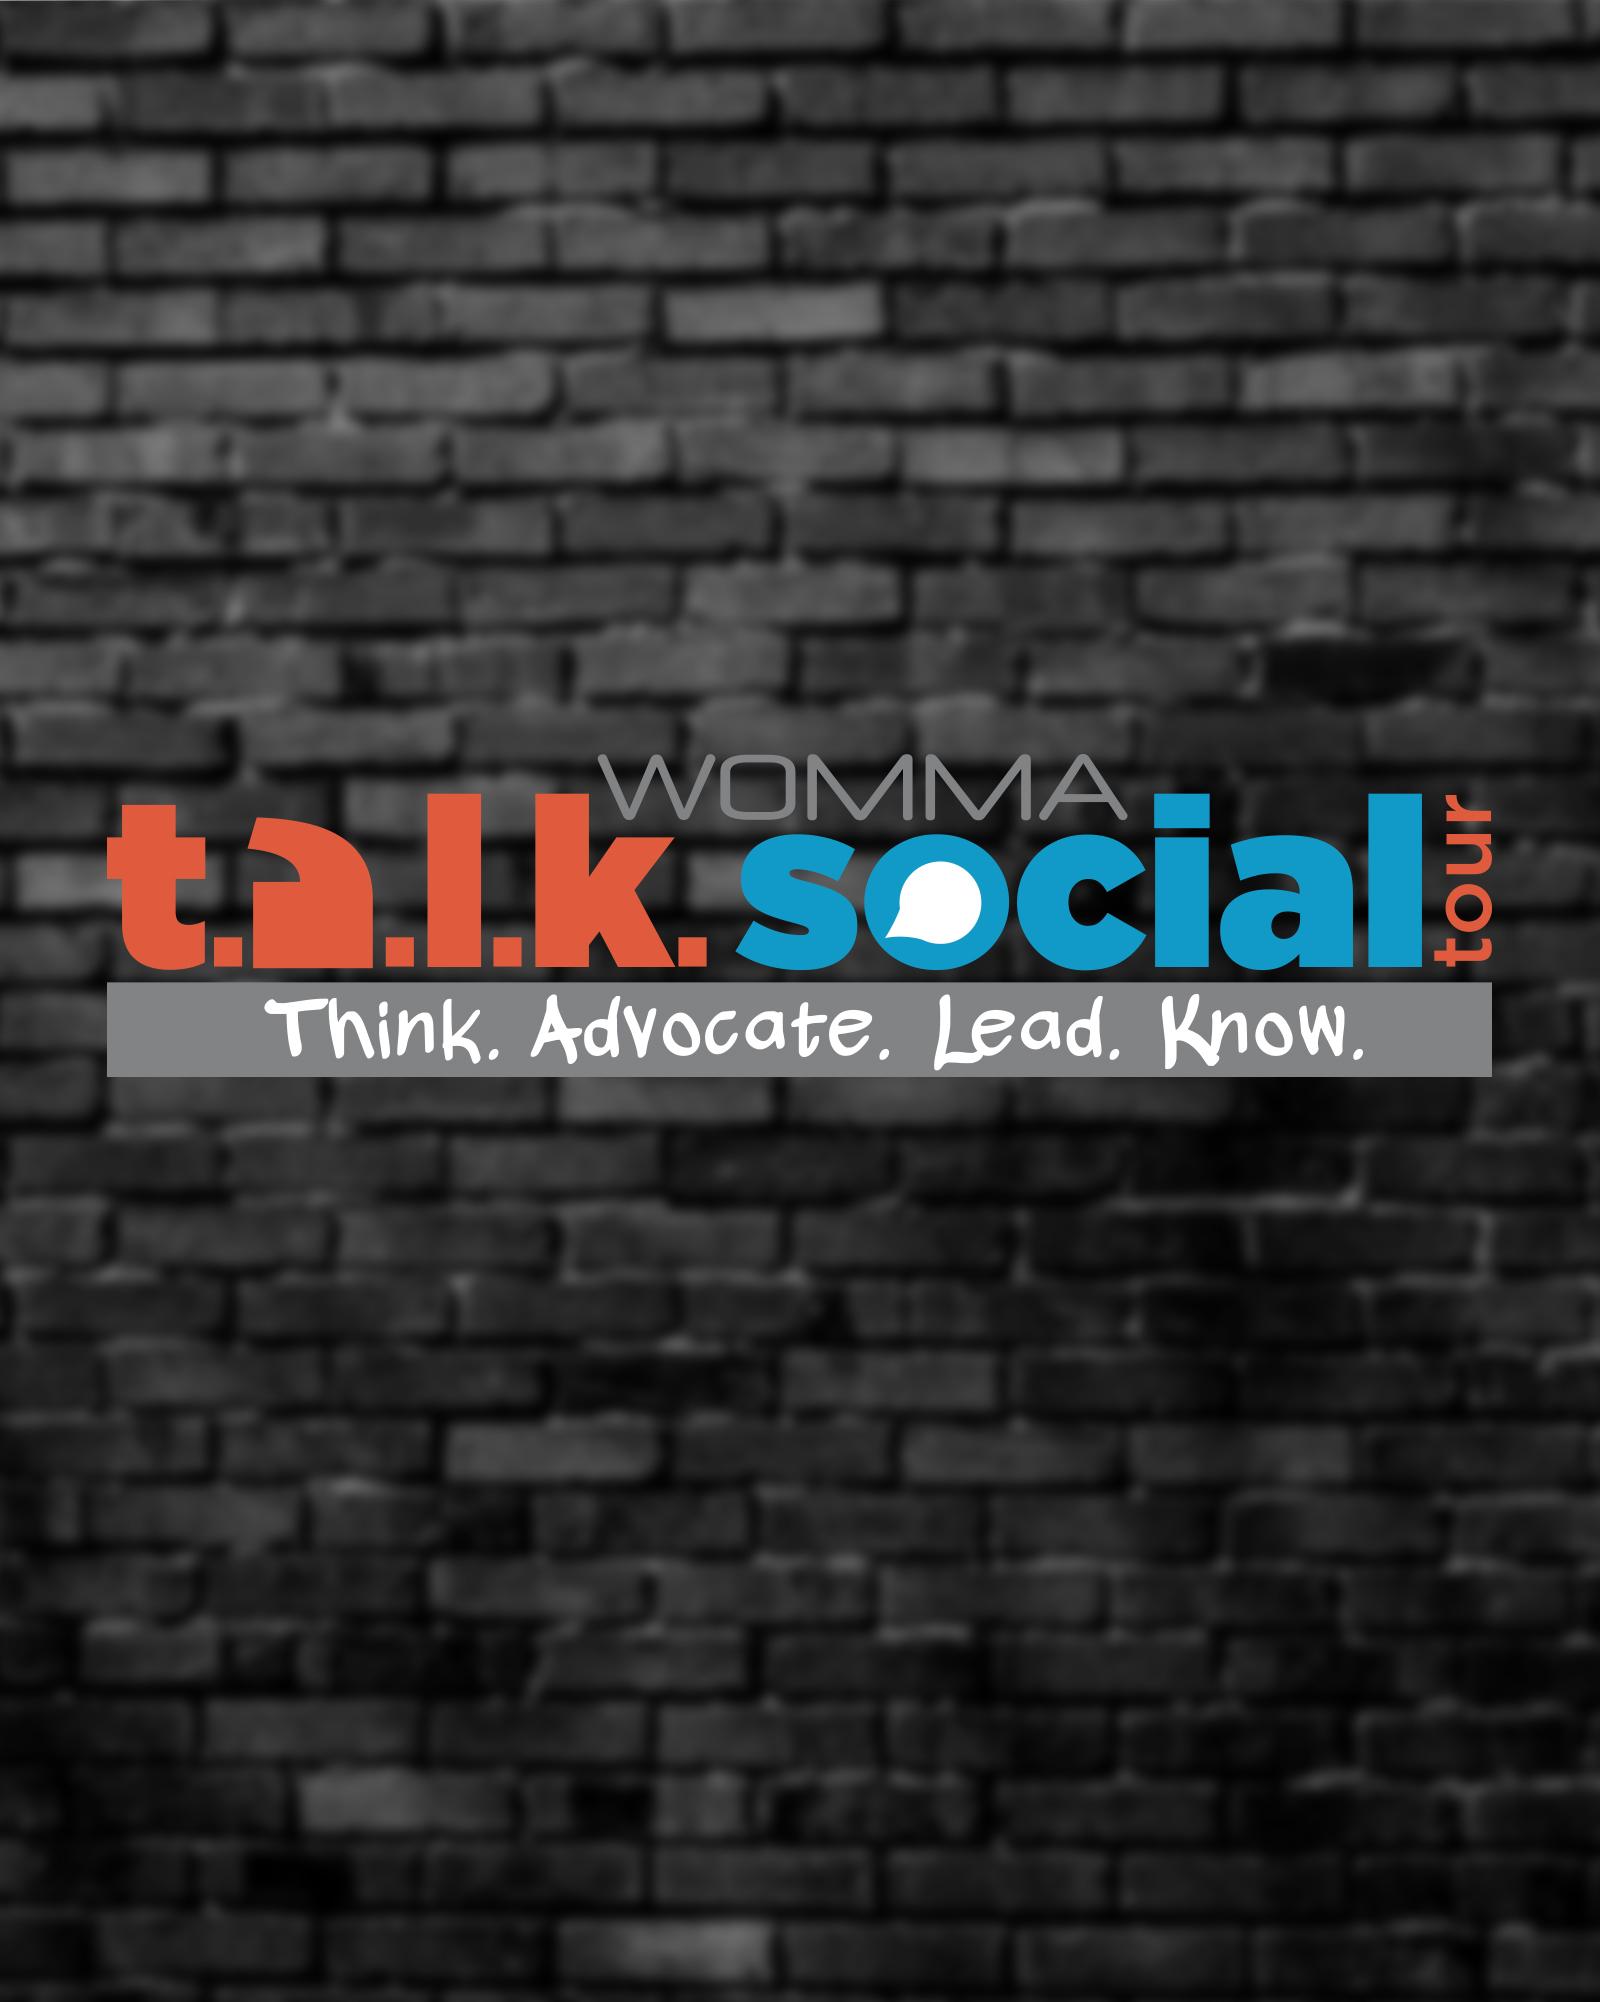 WOMMA T.A.L.K. Social